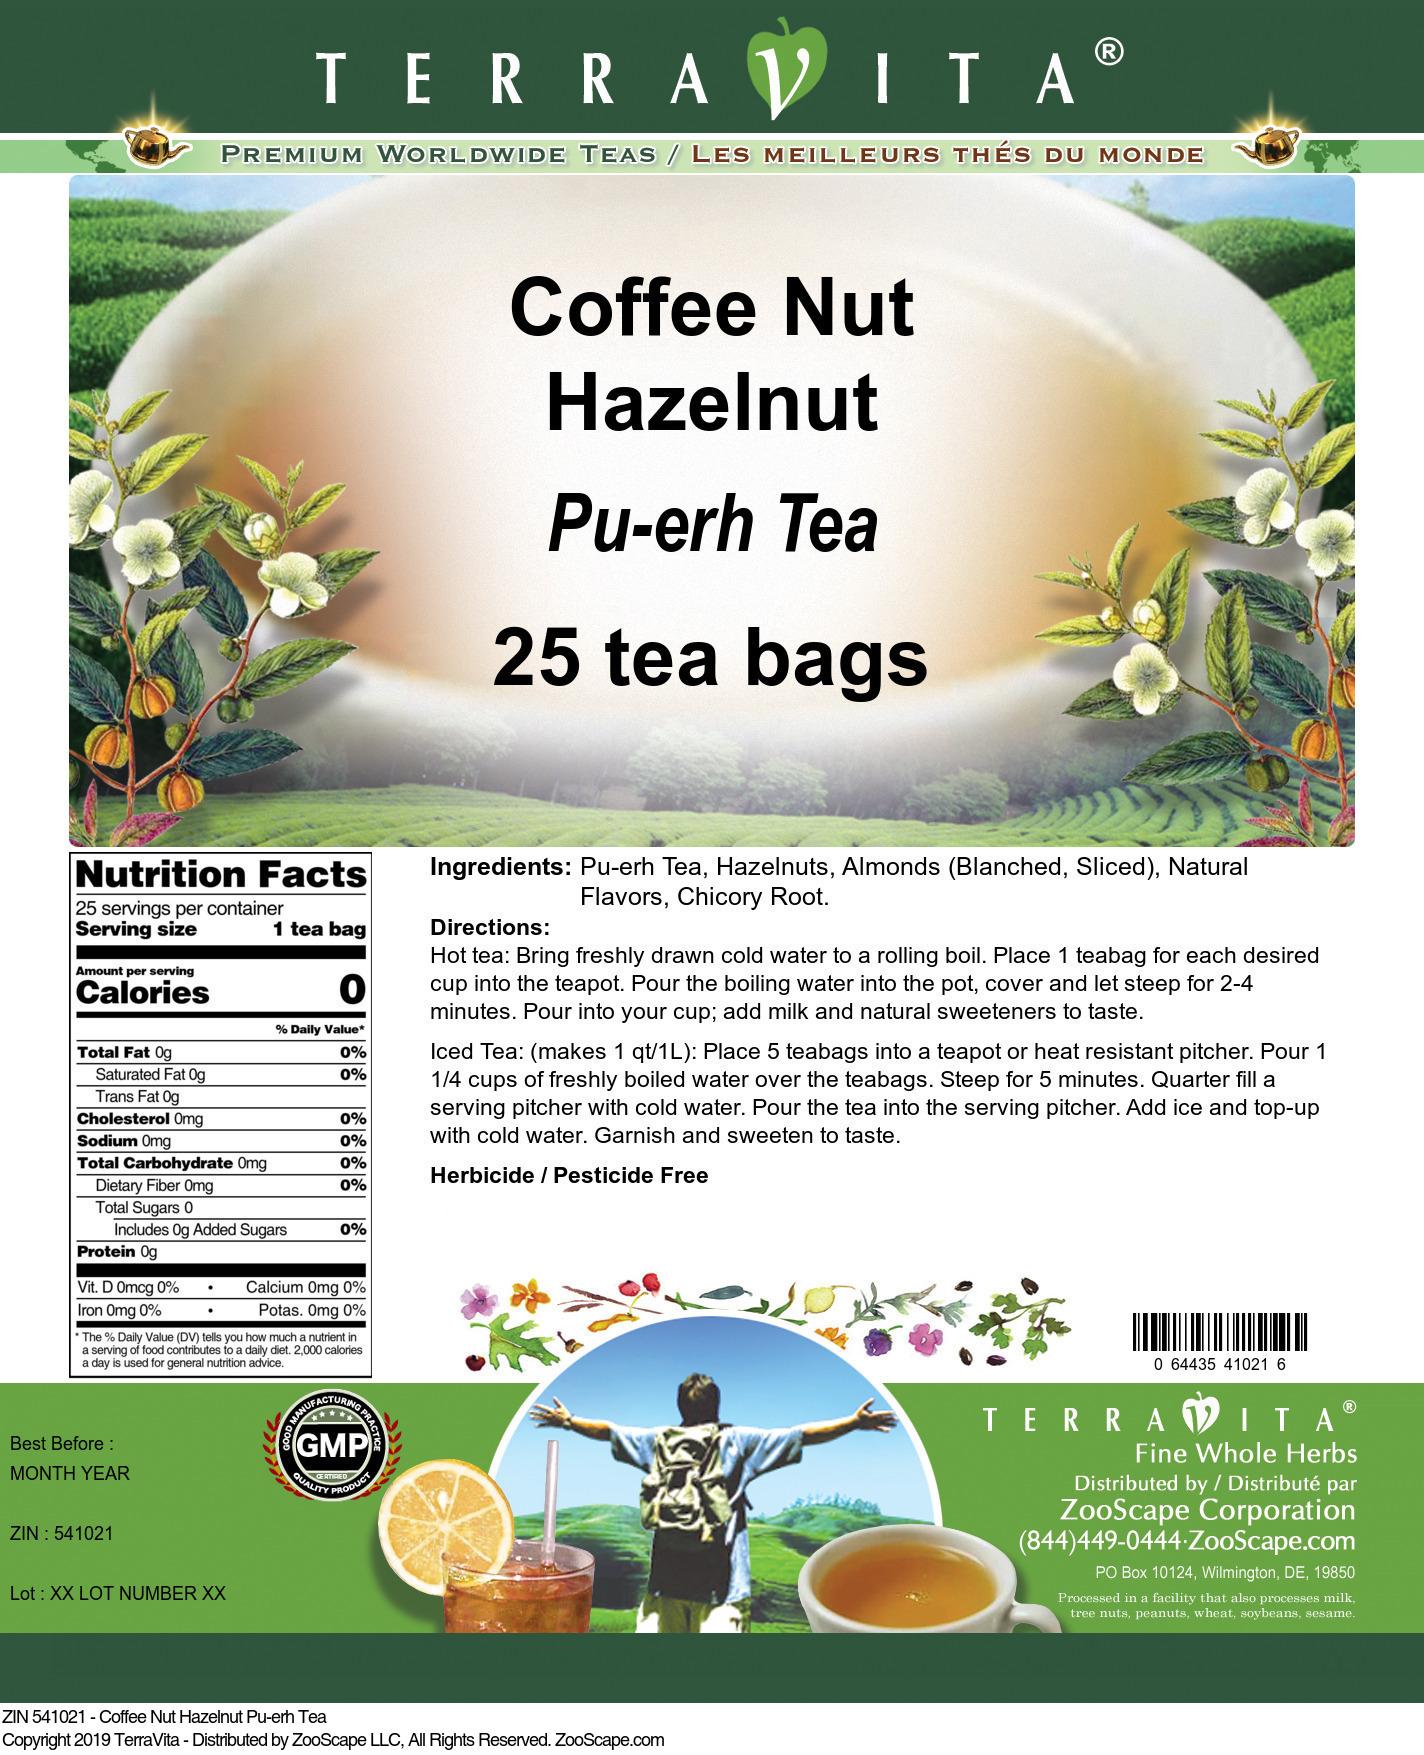 Coffee Nut Hazelnut Pu-erh Tea